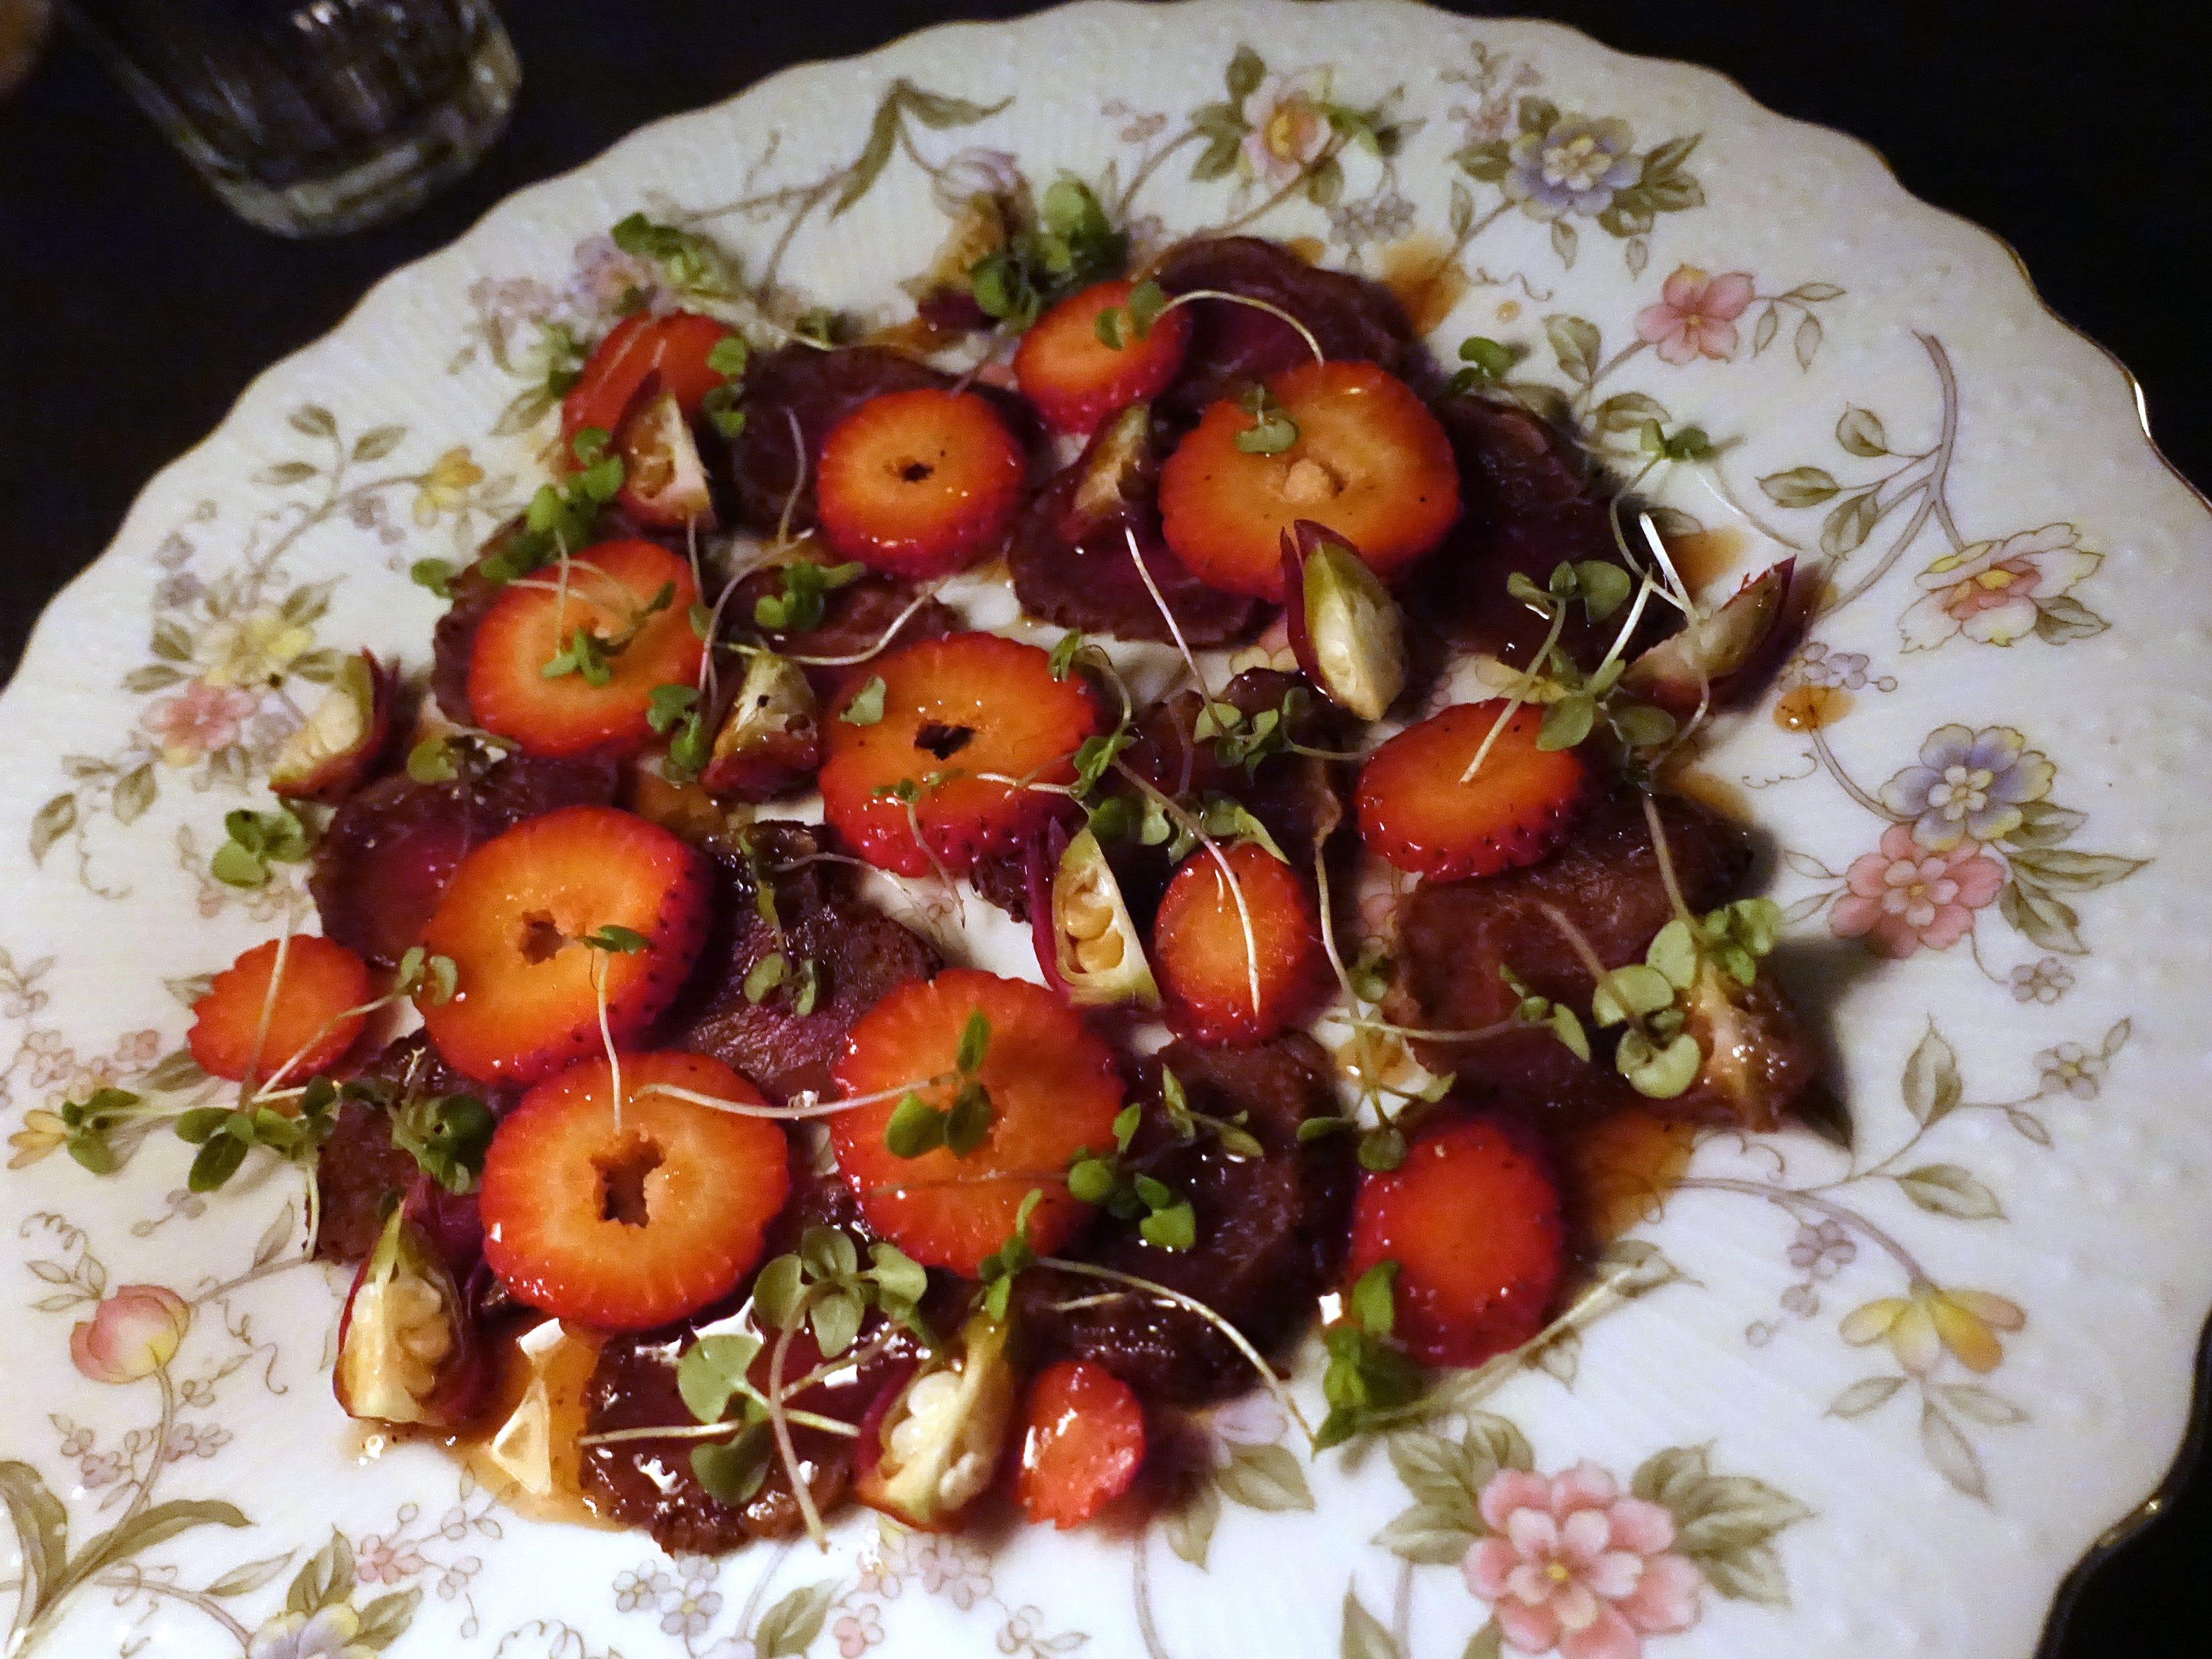 Cabrito tenderloin carpaccio with roselle hips, strawberries and mesquite at Cotton & Copper in Tempe.